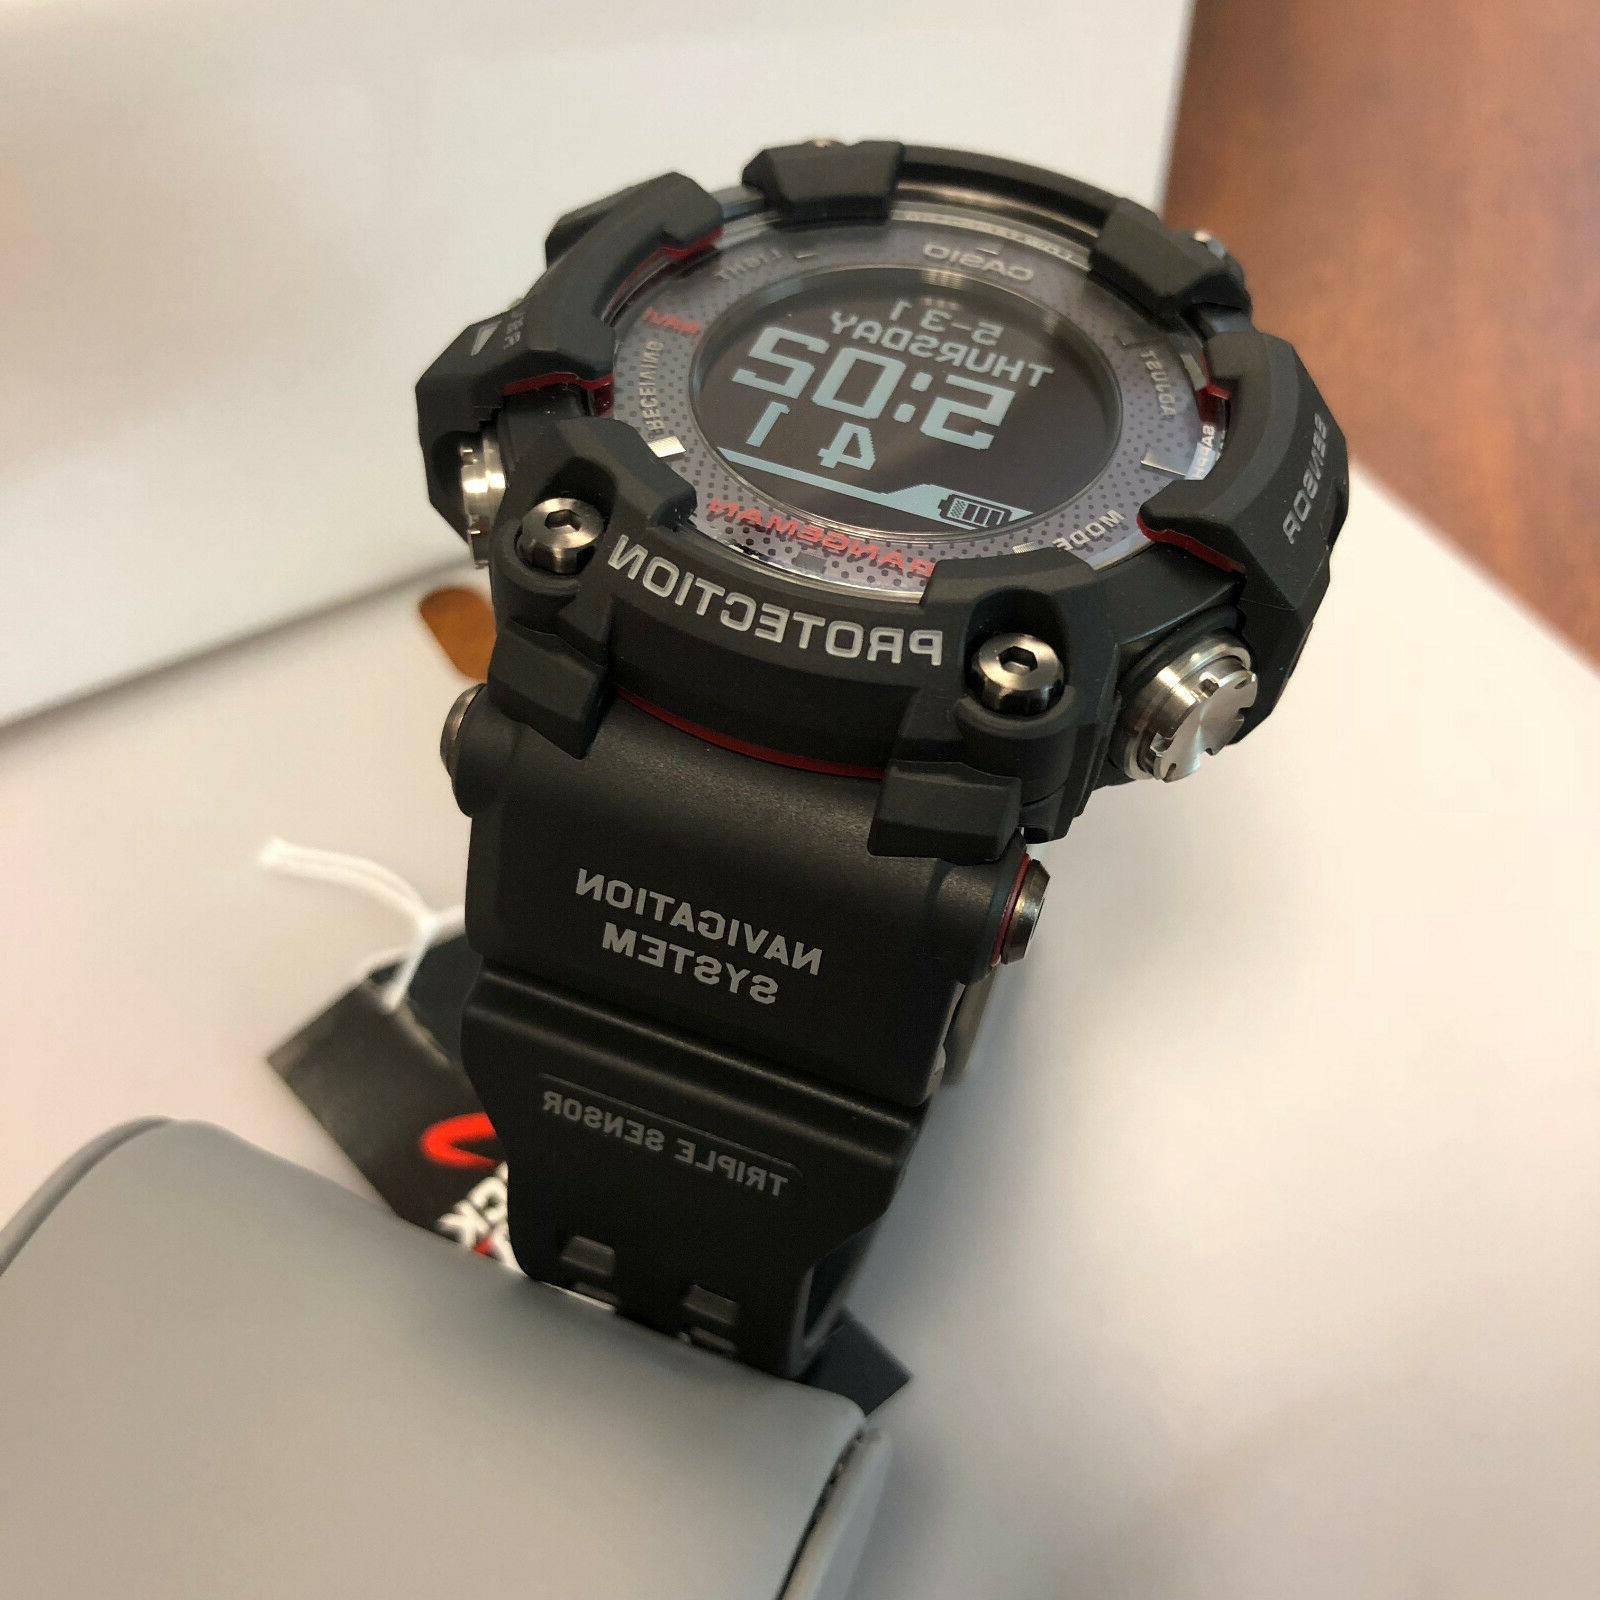 Casio Navigation GPRB1000-1 Triple Watch New